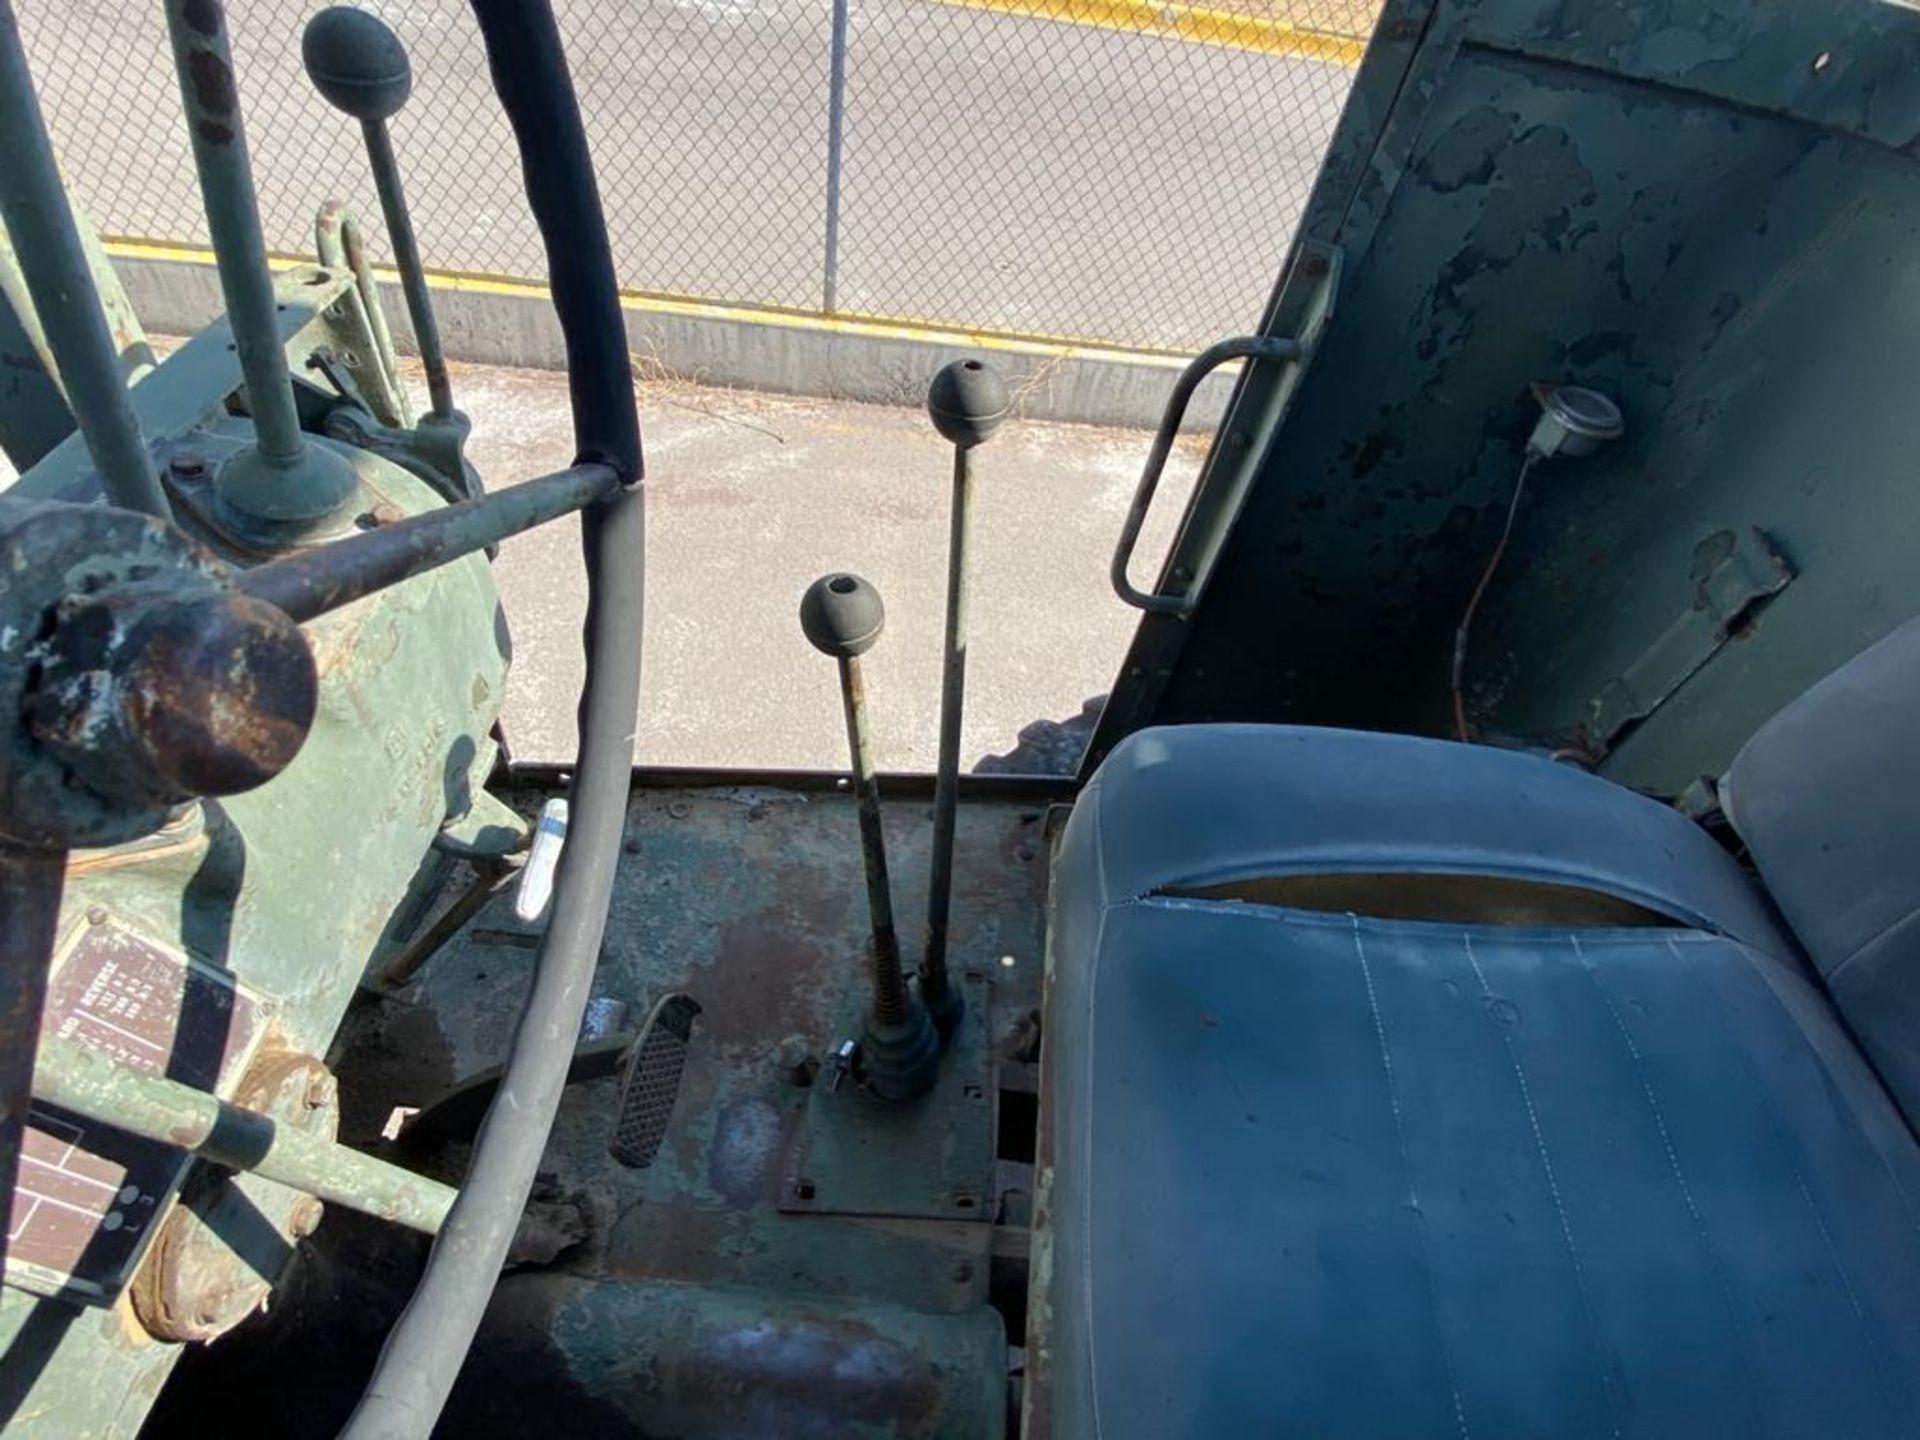 1970 Wabco4 440H Motor Grader, Serial number 440HAGM1398 - Image 49 of 77